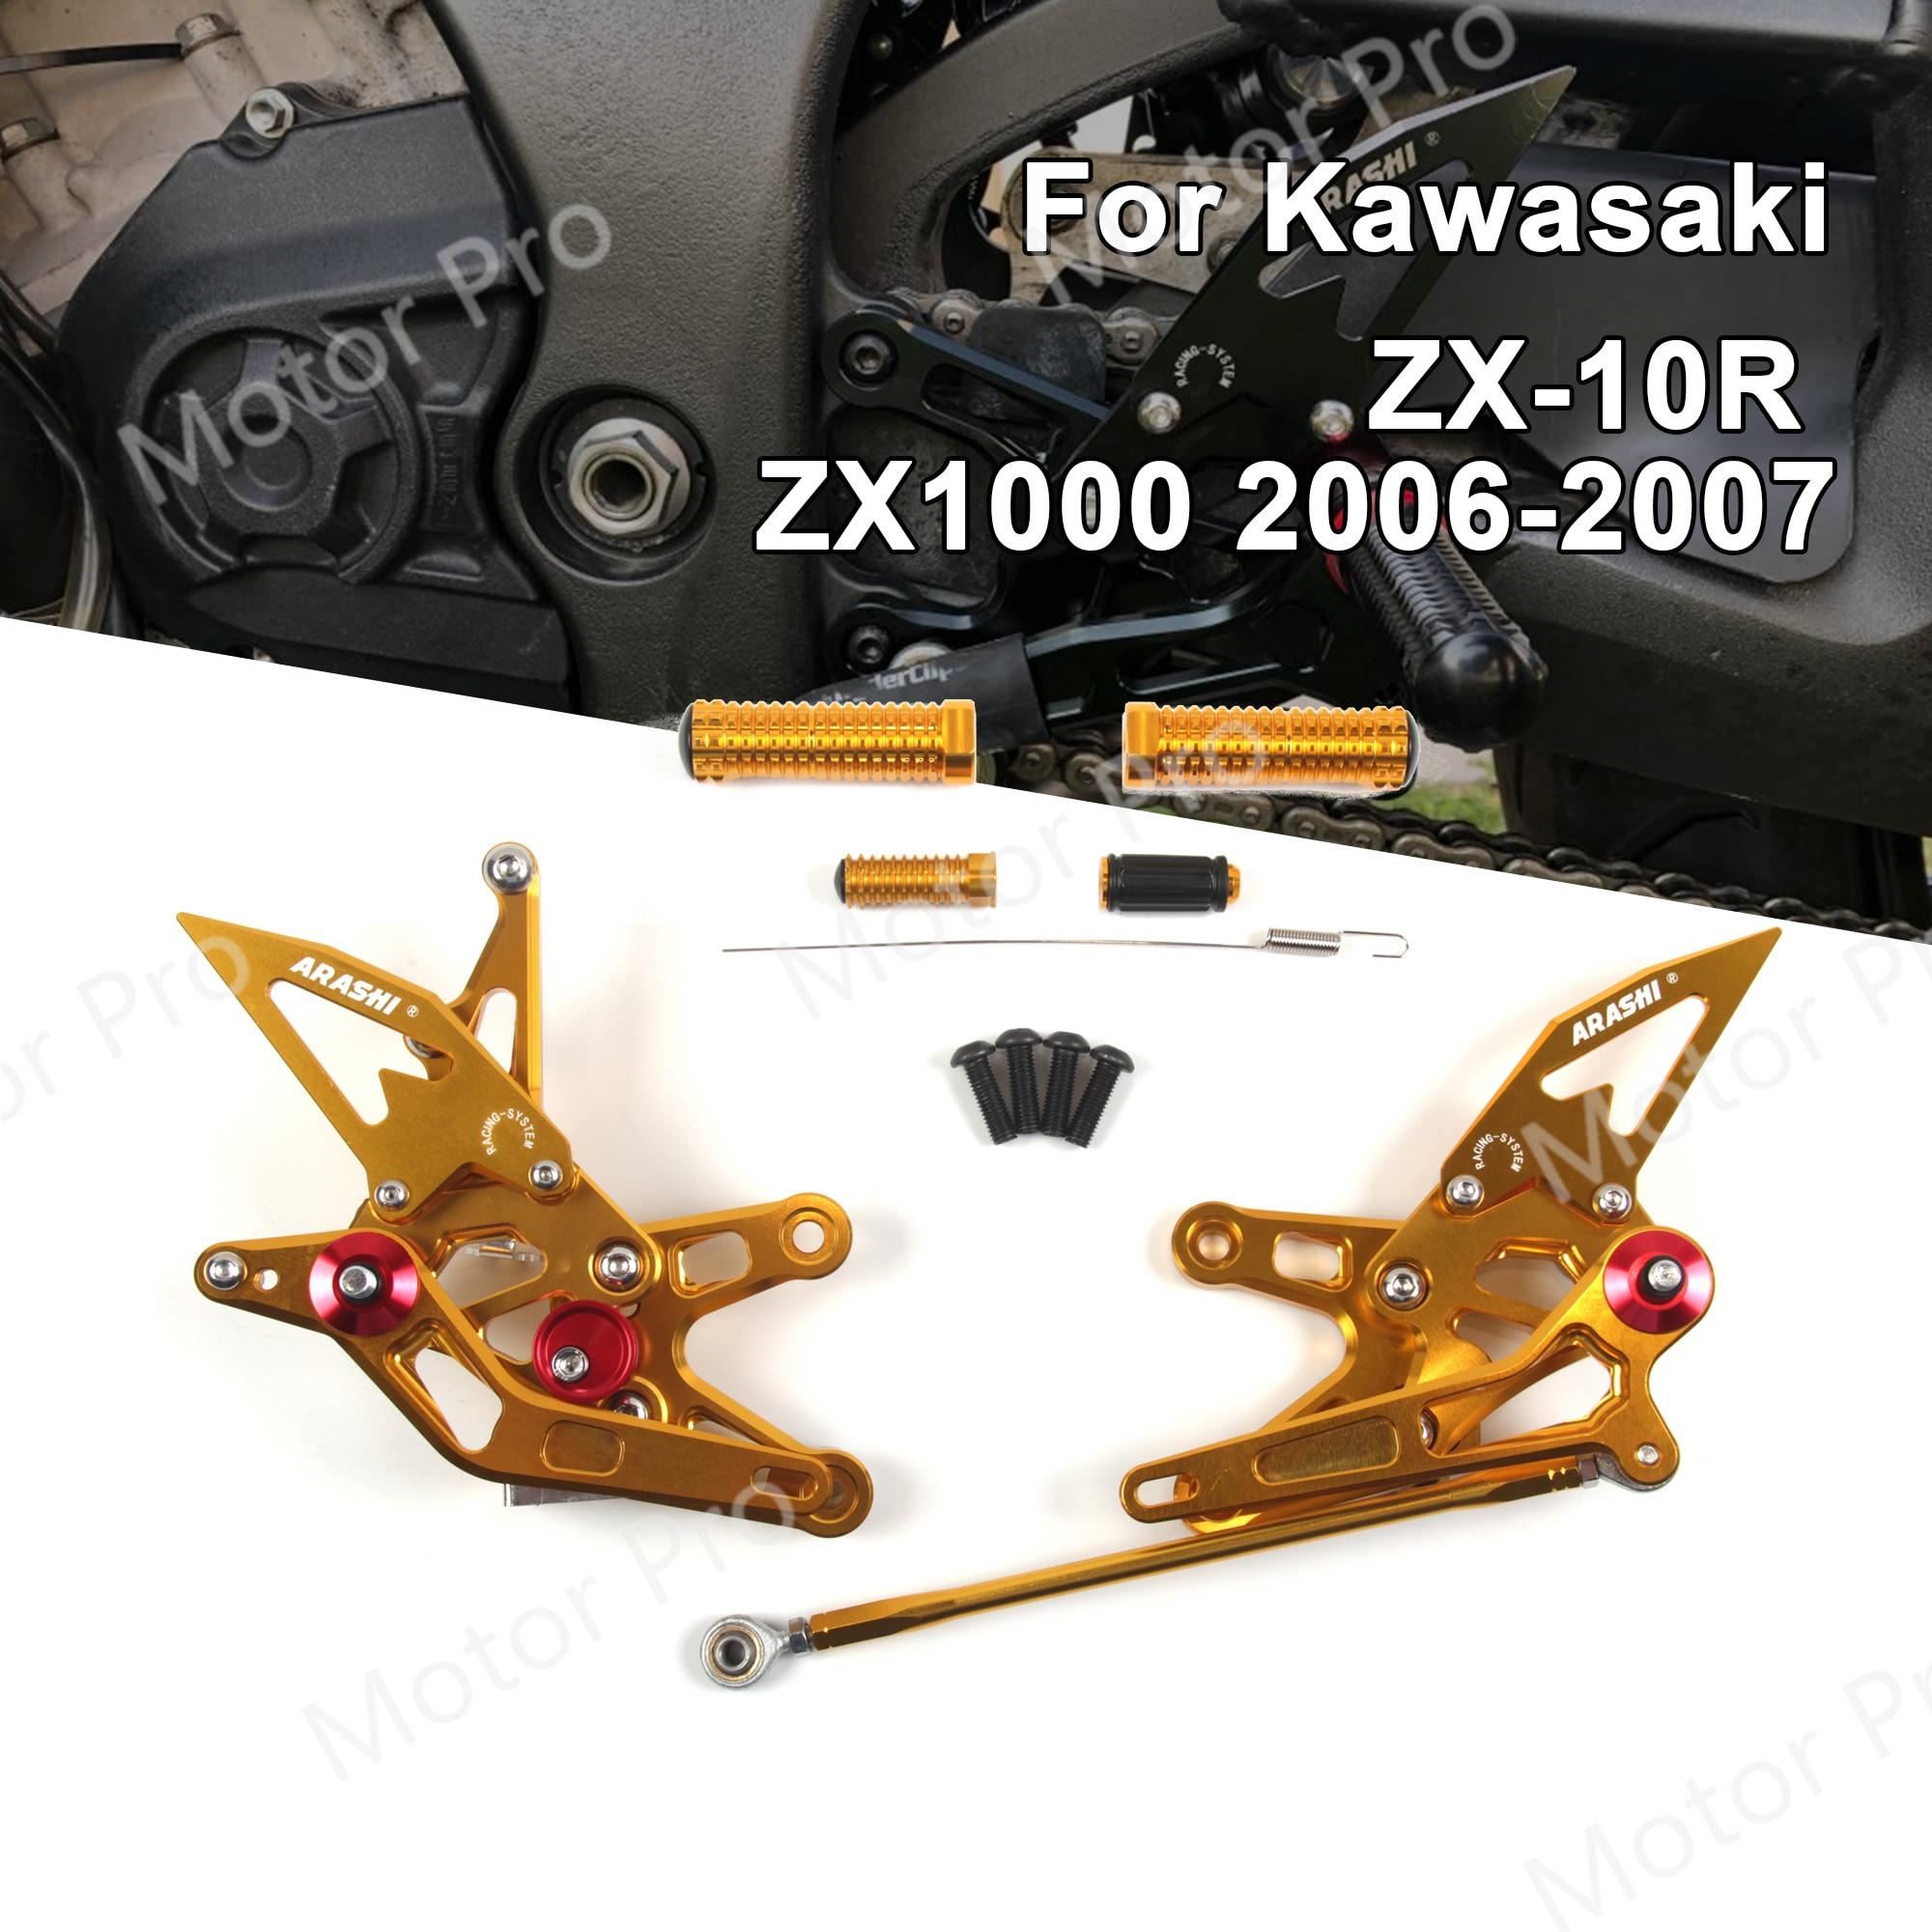 Reposapiés ajustables para Kawasaki Ninja ZX10R 2006 2007, accesorios para motocicleta, reposapiés, pedales ZX1000 ZX 1000 ZX-10R